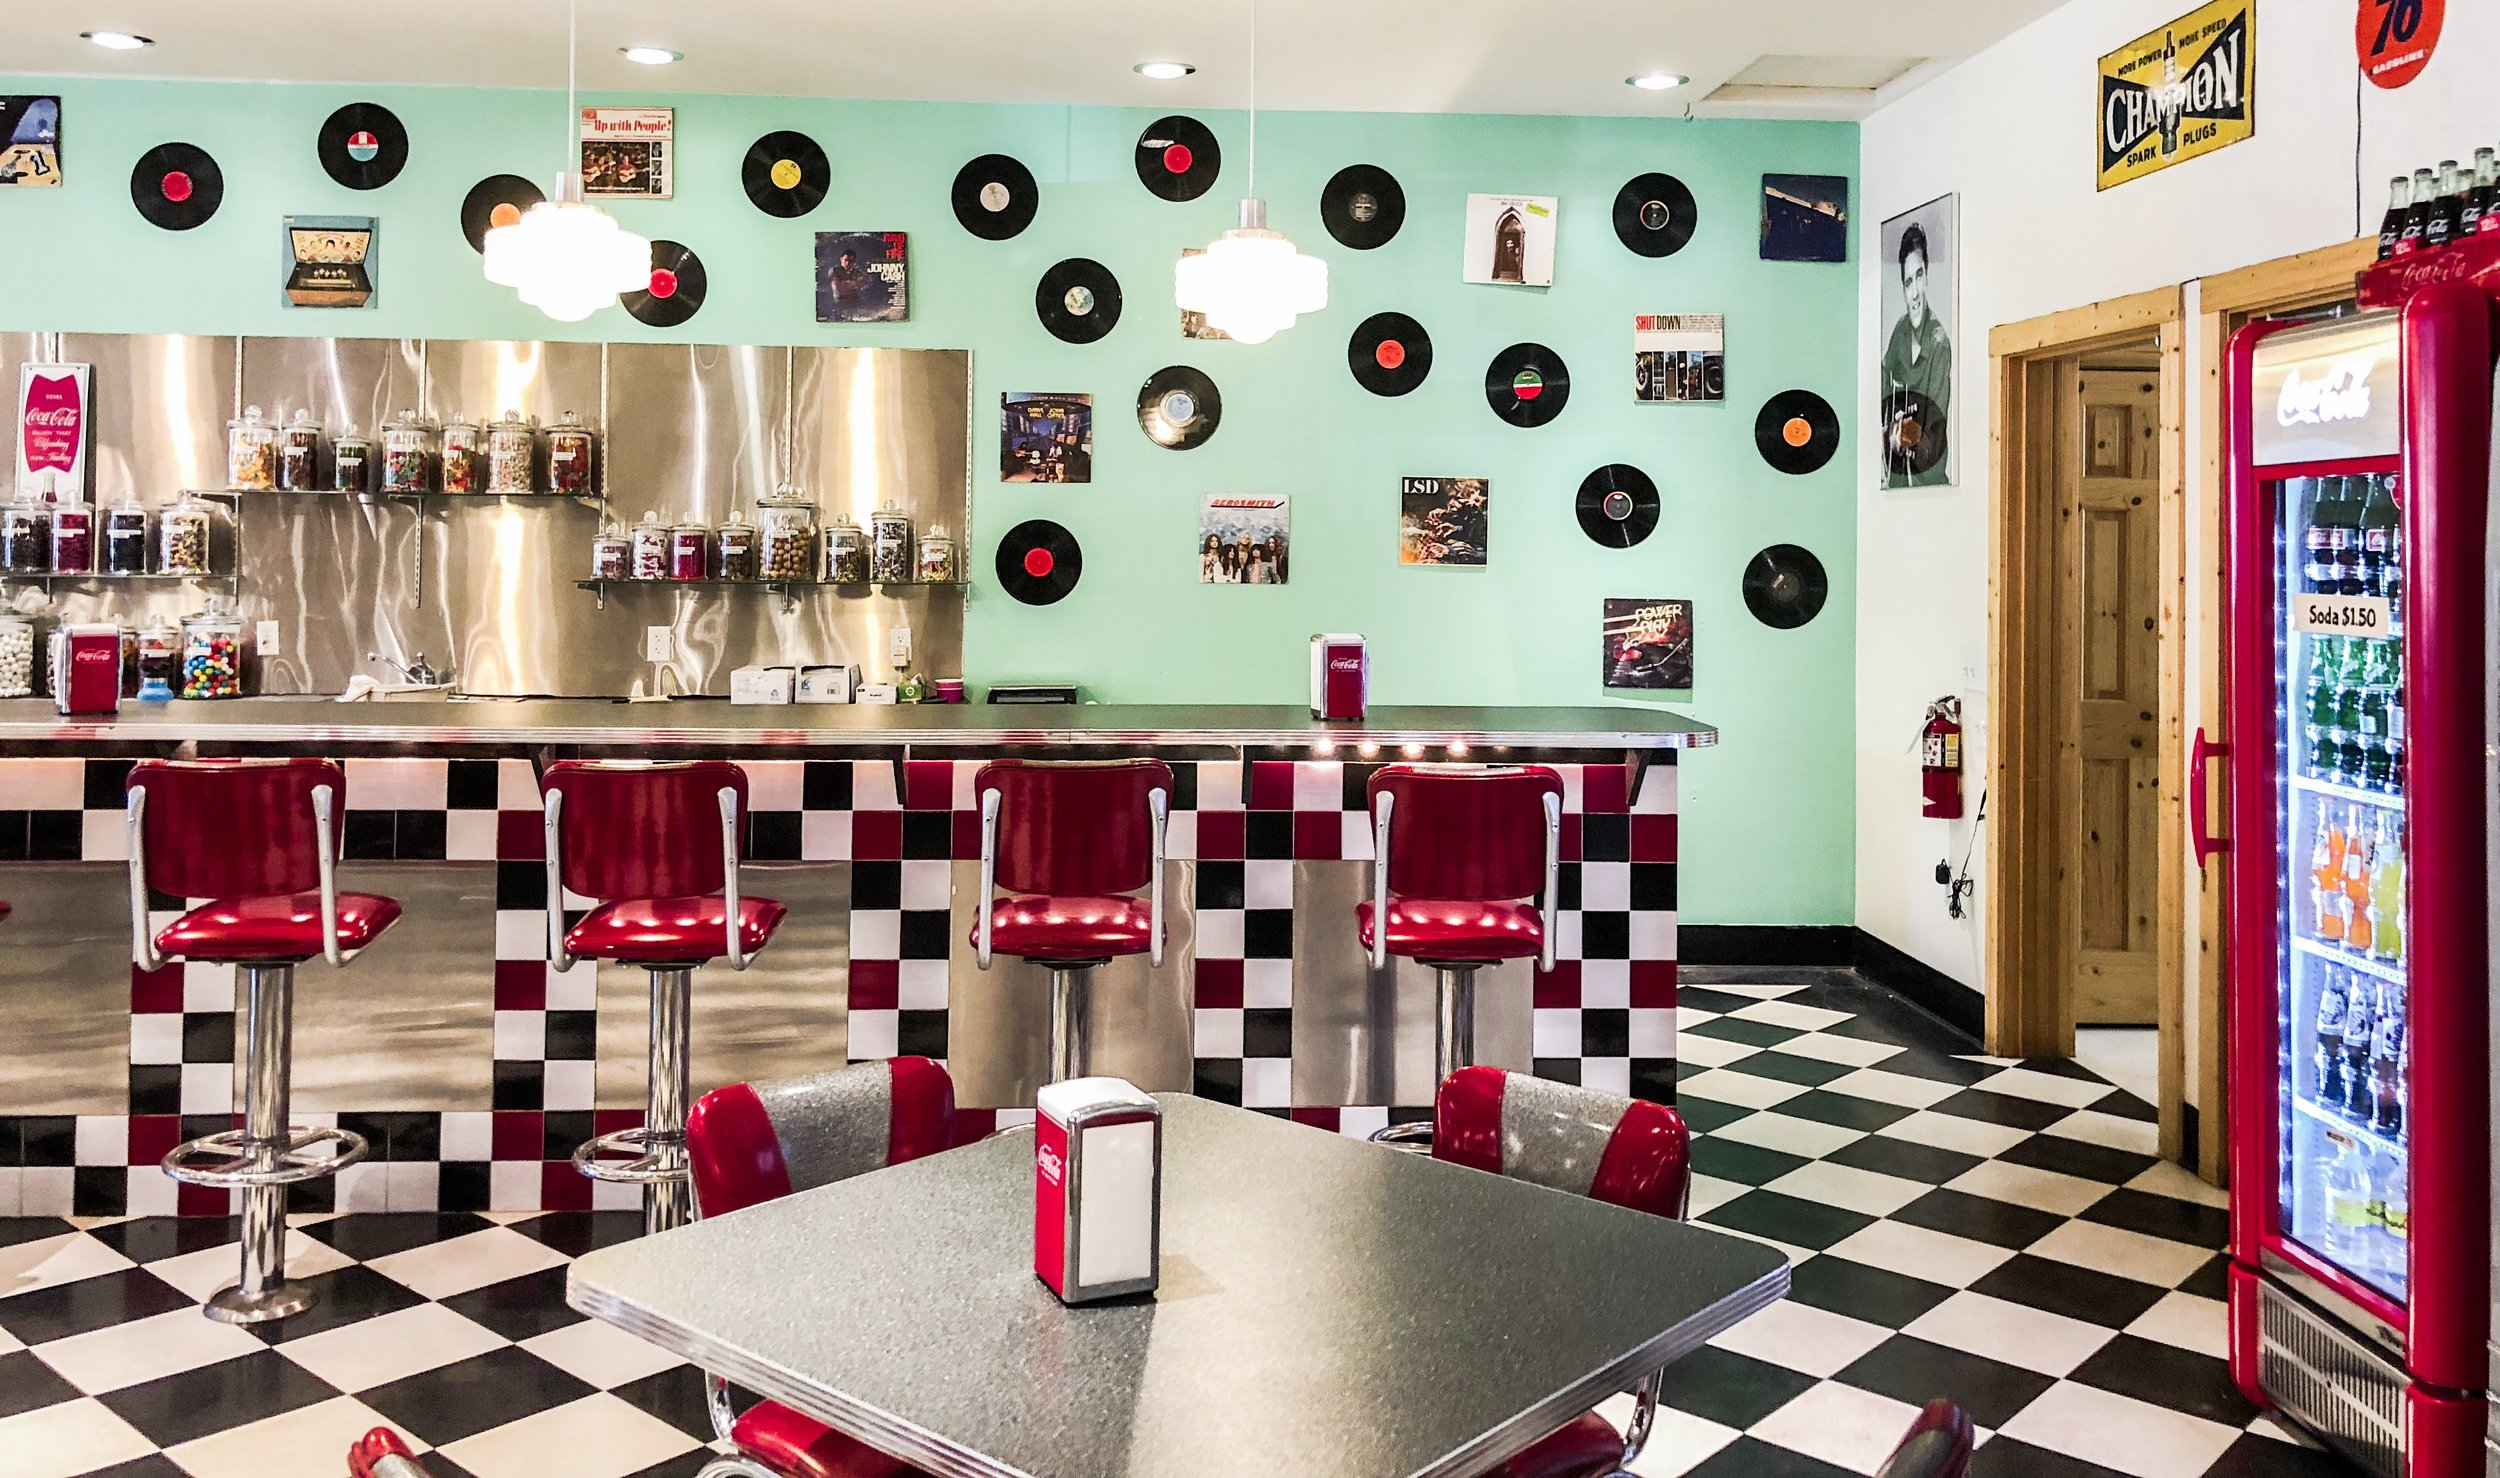 Old Fashioned Diner in Oregon